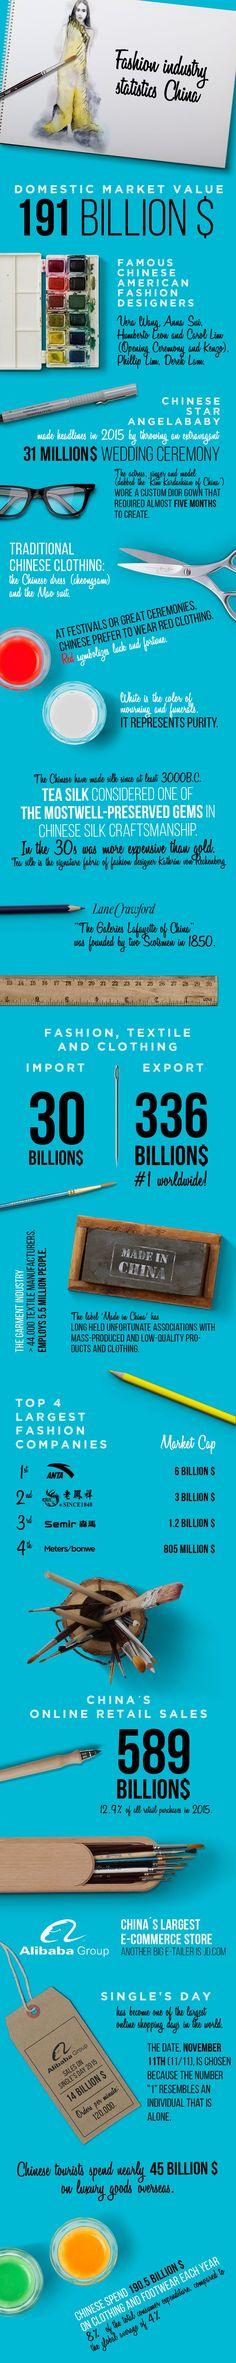 Fashion industry statistics infographics part 4: China